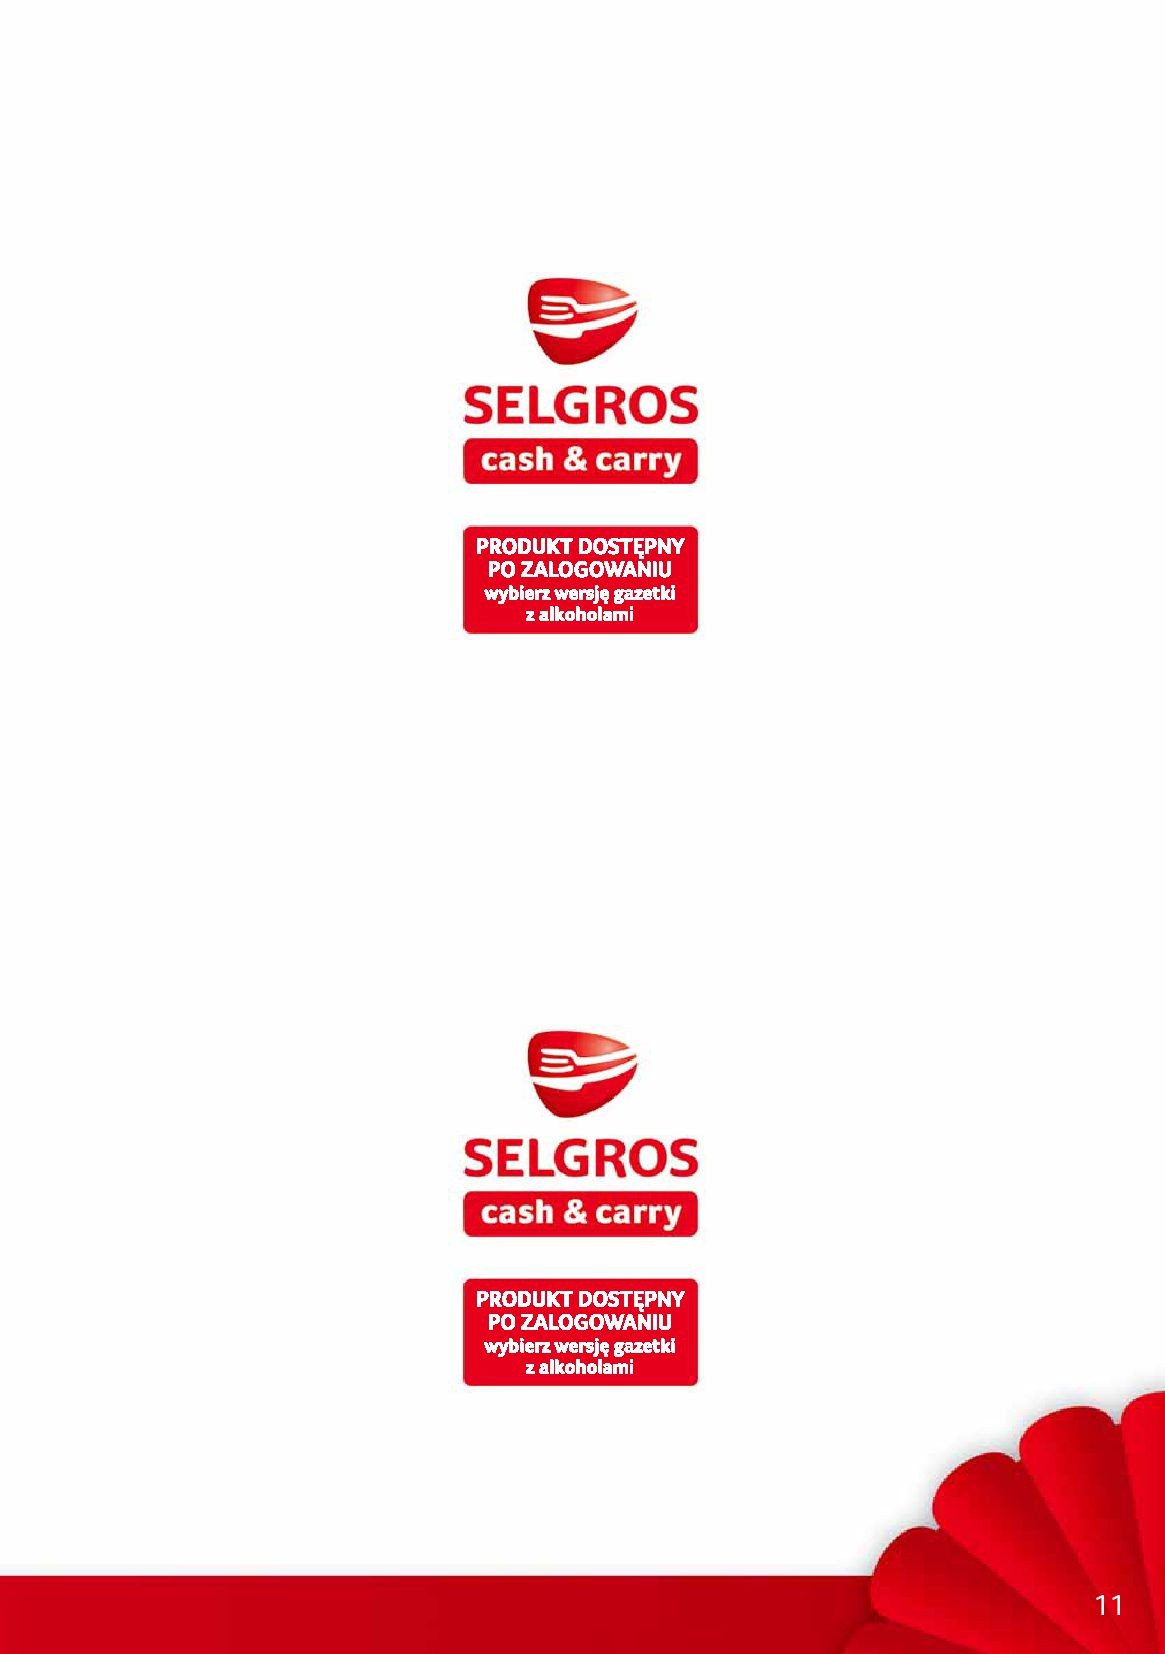 Gazetka Selgros - Debiuty w Selgros-11.09.2019-25.09.2019-page-11